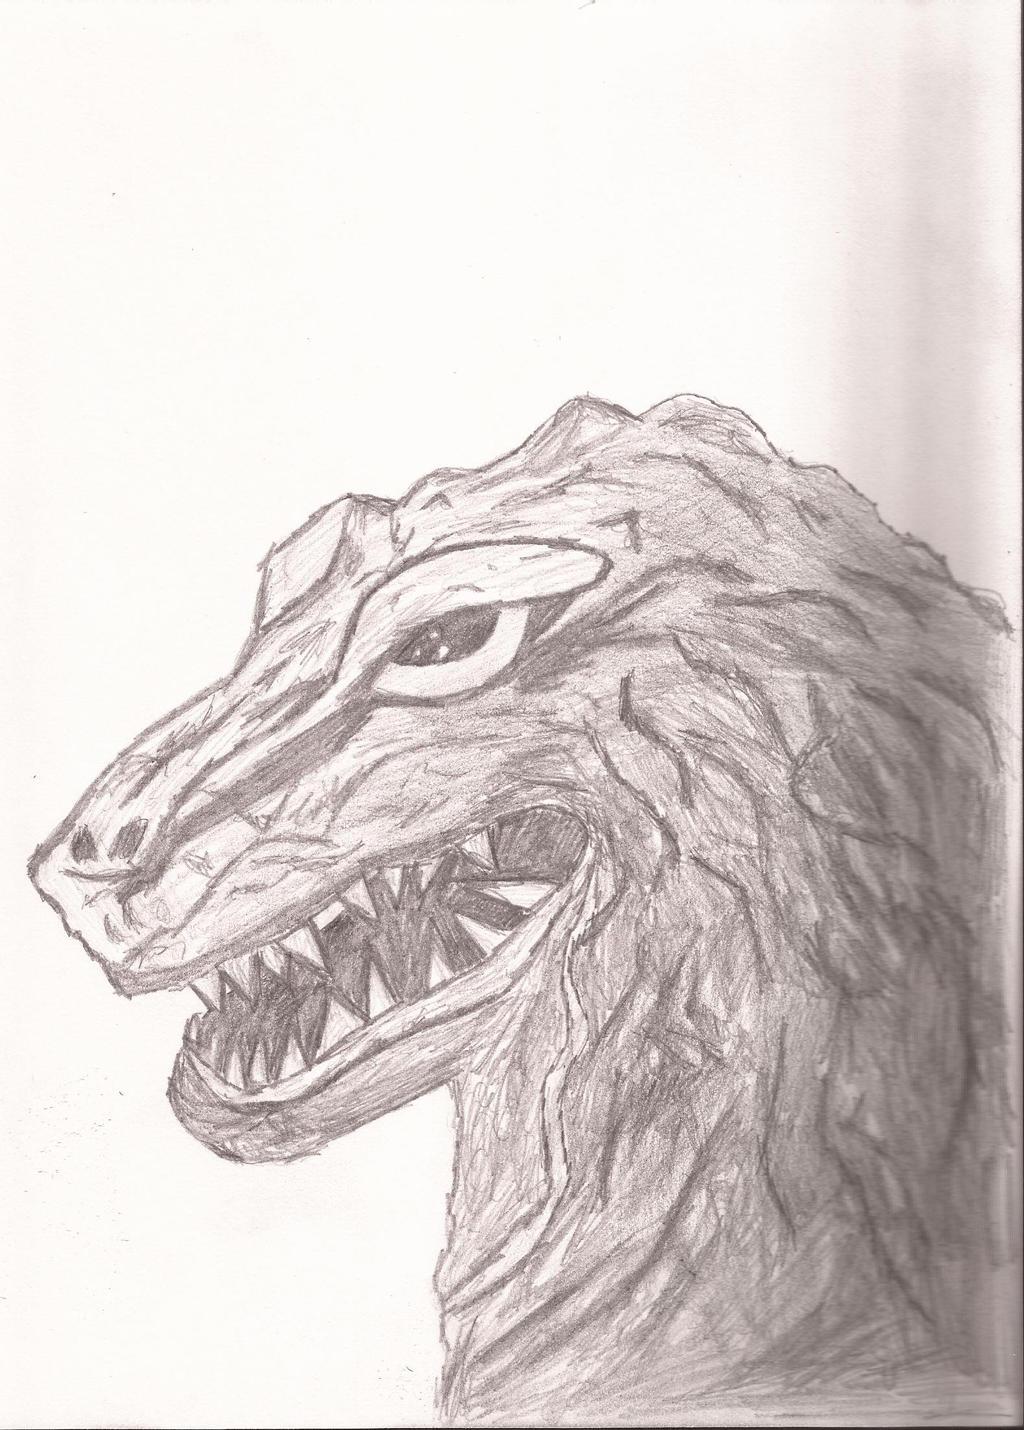 Godzilla 62 pencil sketch kinggoji by nik ainu on deviantart